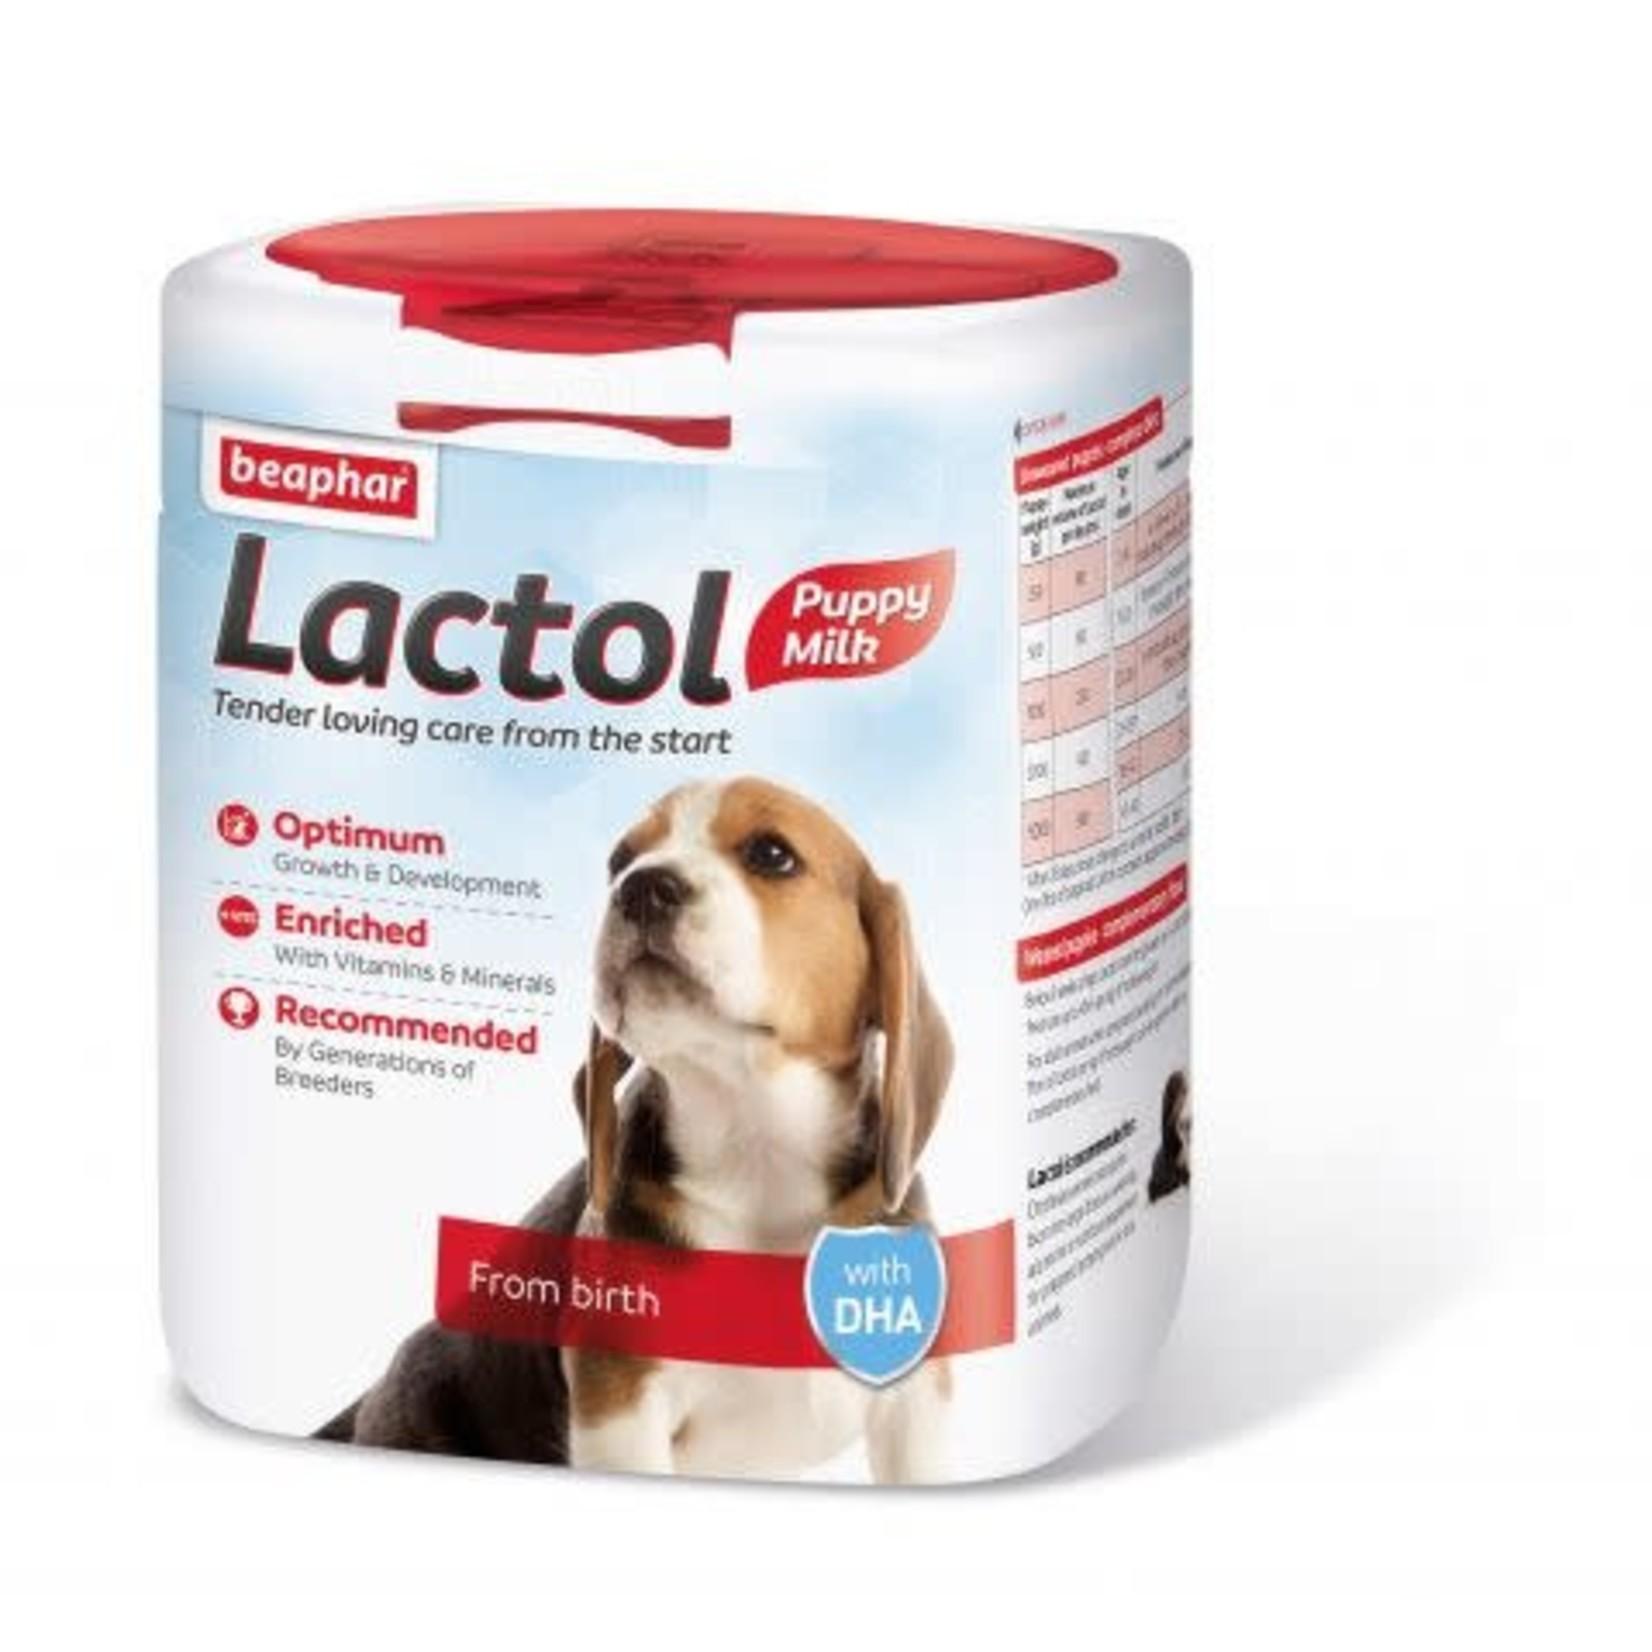 Beaphar Lactol Puppy Milk Replacer